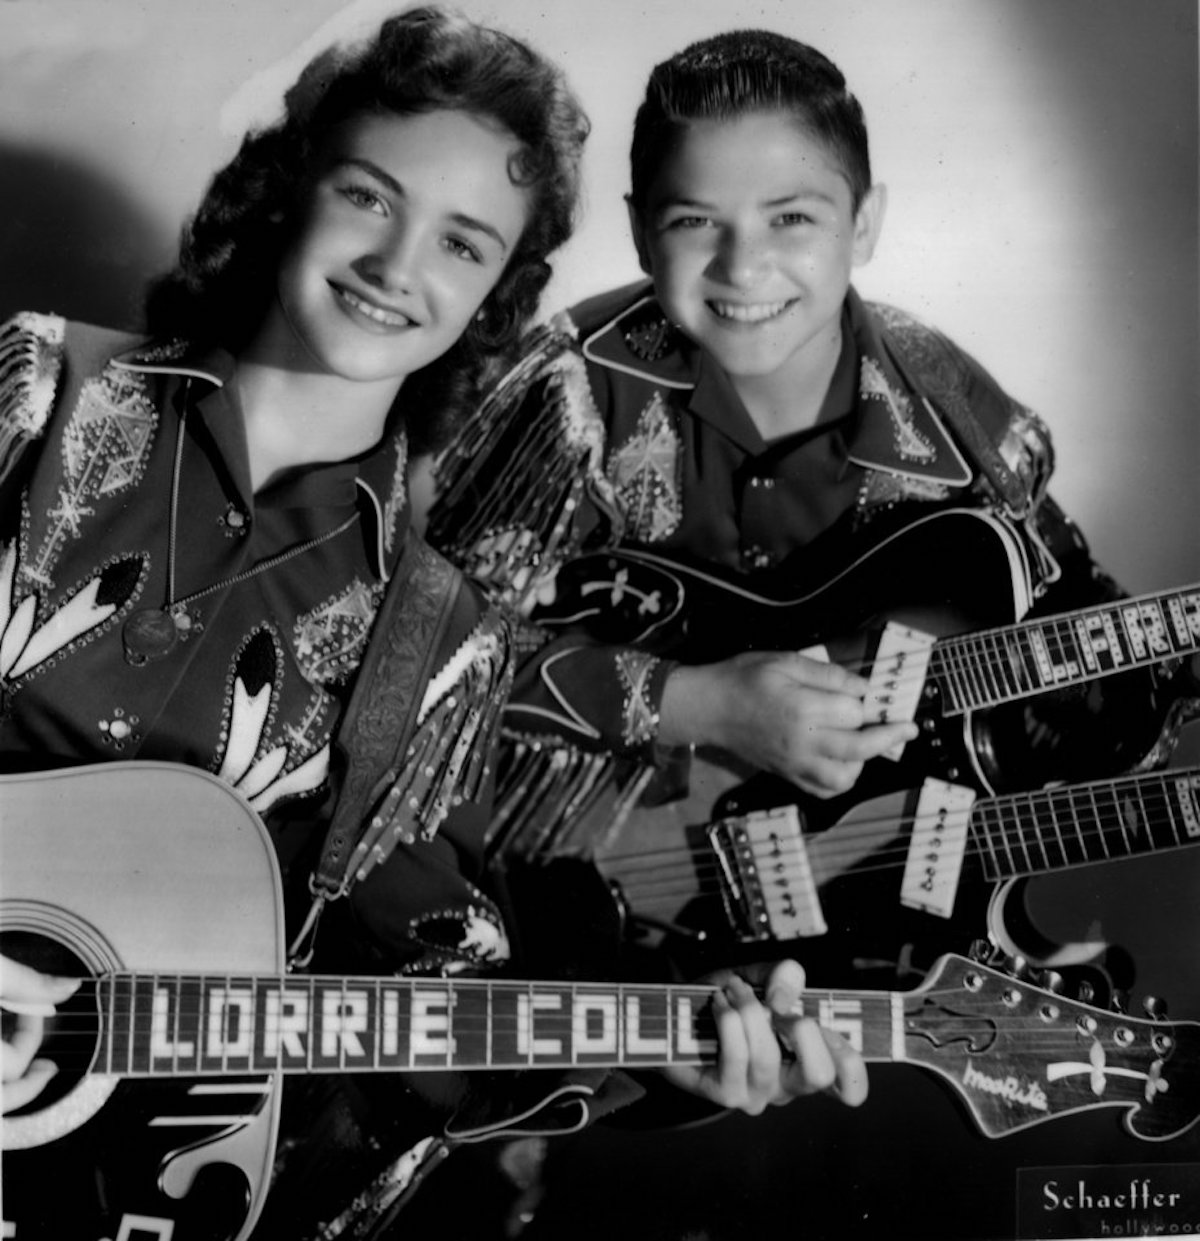 Lorrie Collins